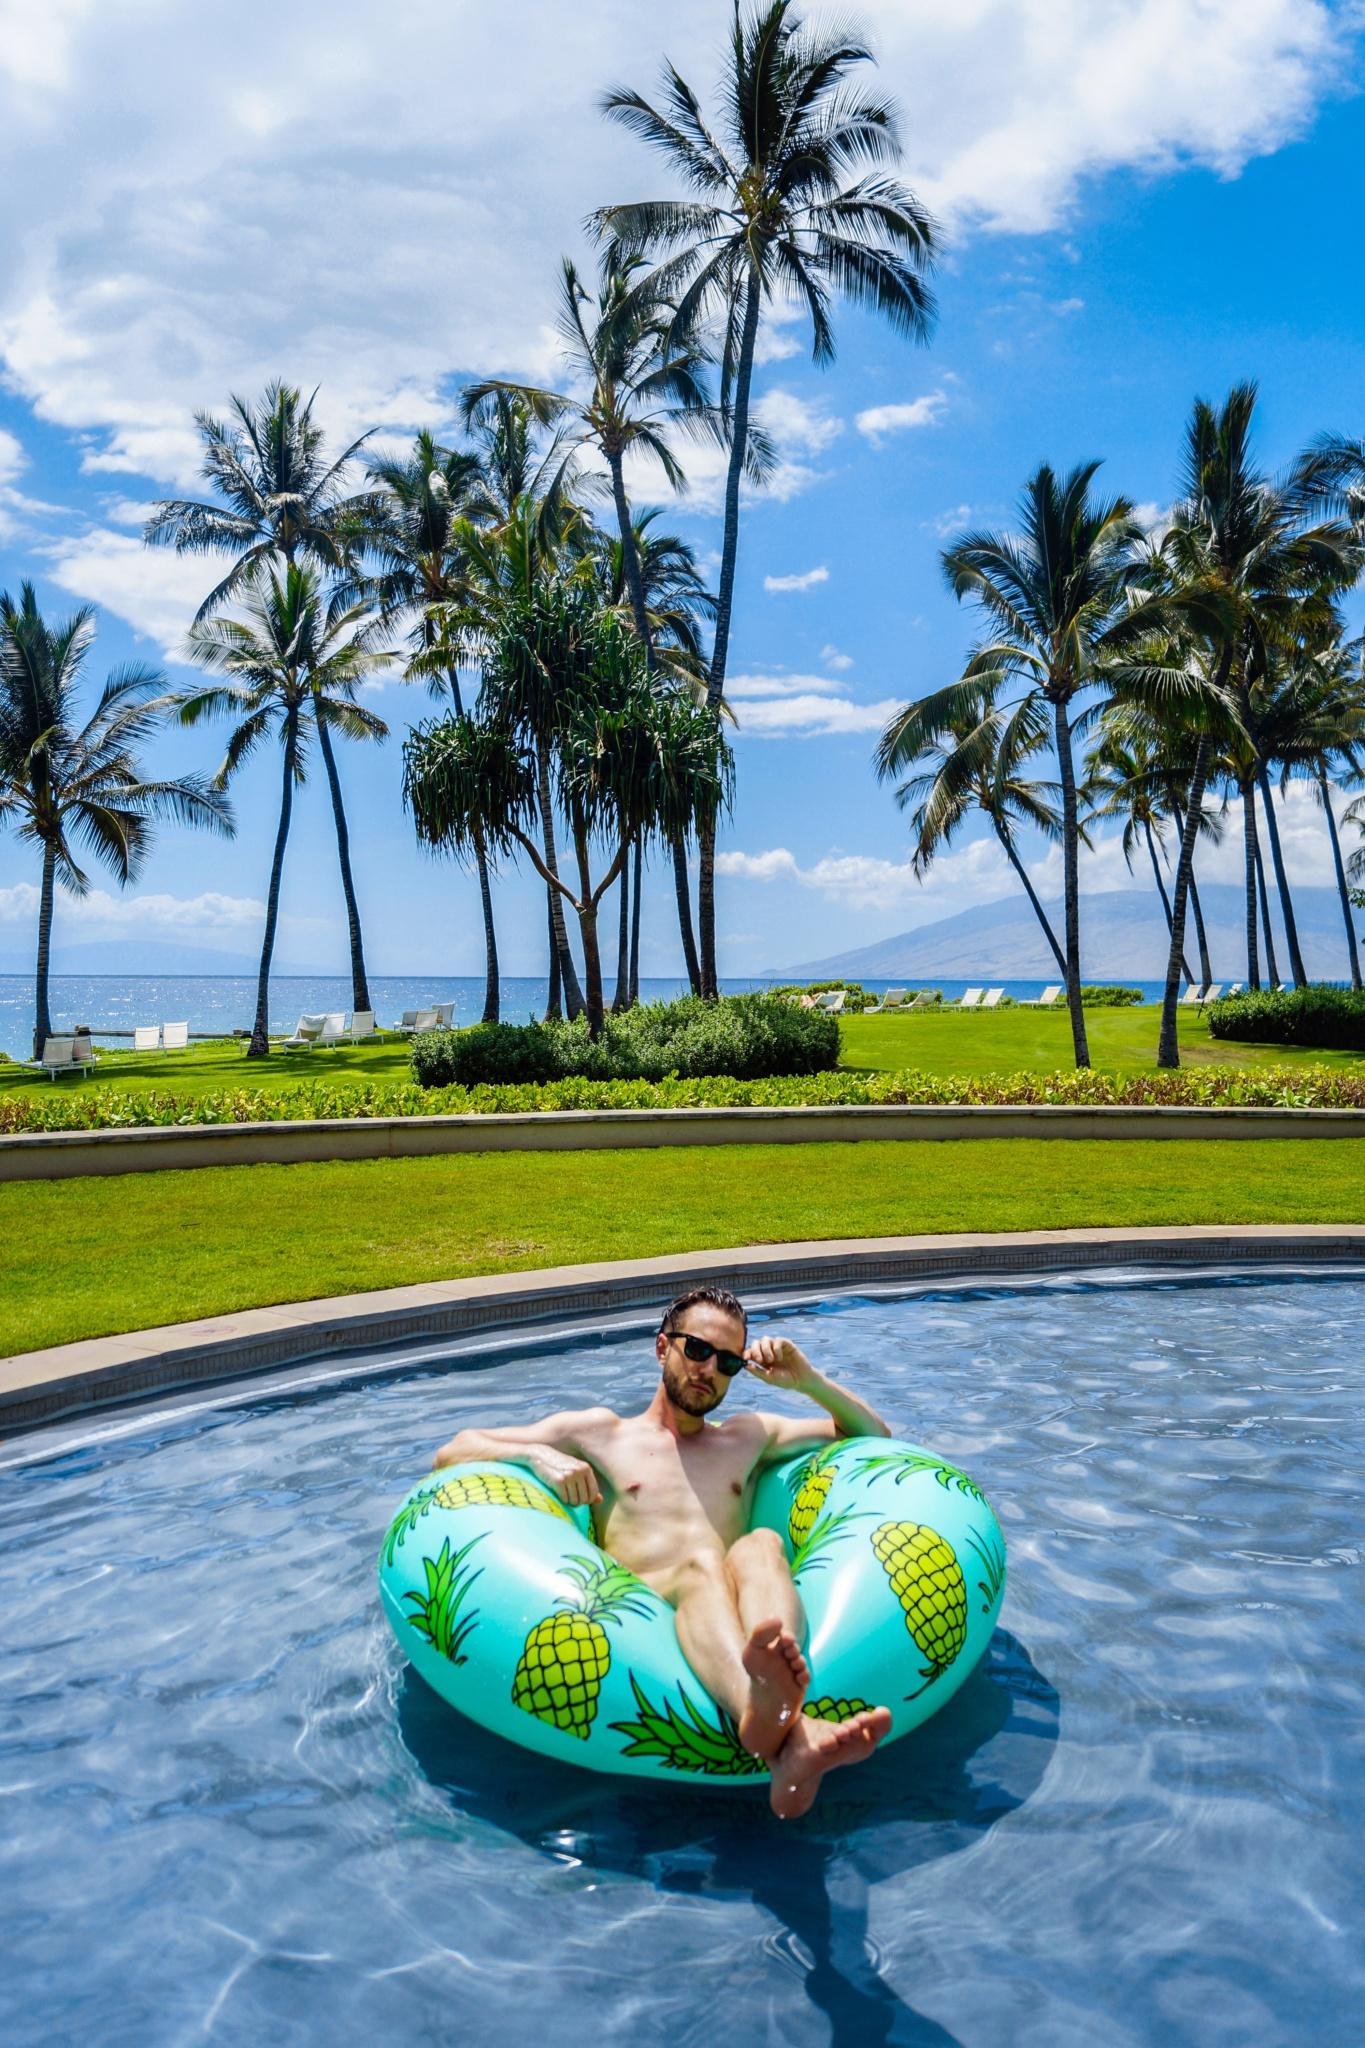 Pineapple Pool Float - Pineapple Pool Floatie - Mint - Hawaii Maui Wailea - Andaz Maui at Wailea Resort - Summer - Beach - Topman Blue Camouflage Swim Shorts - Killer Travel - Killer Look Travels - TheKillerLook.com - The Killer Look